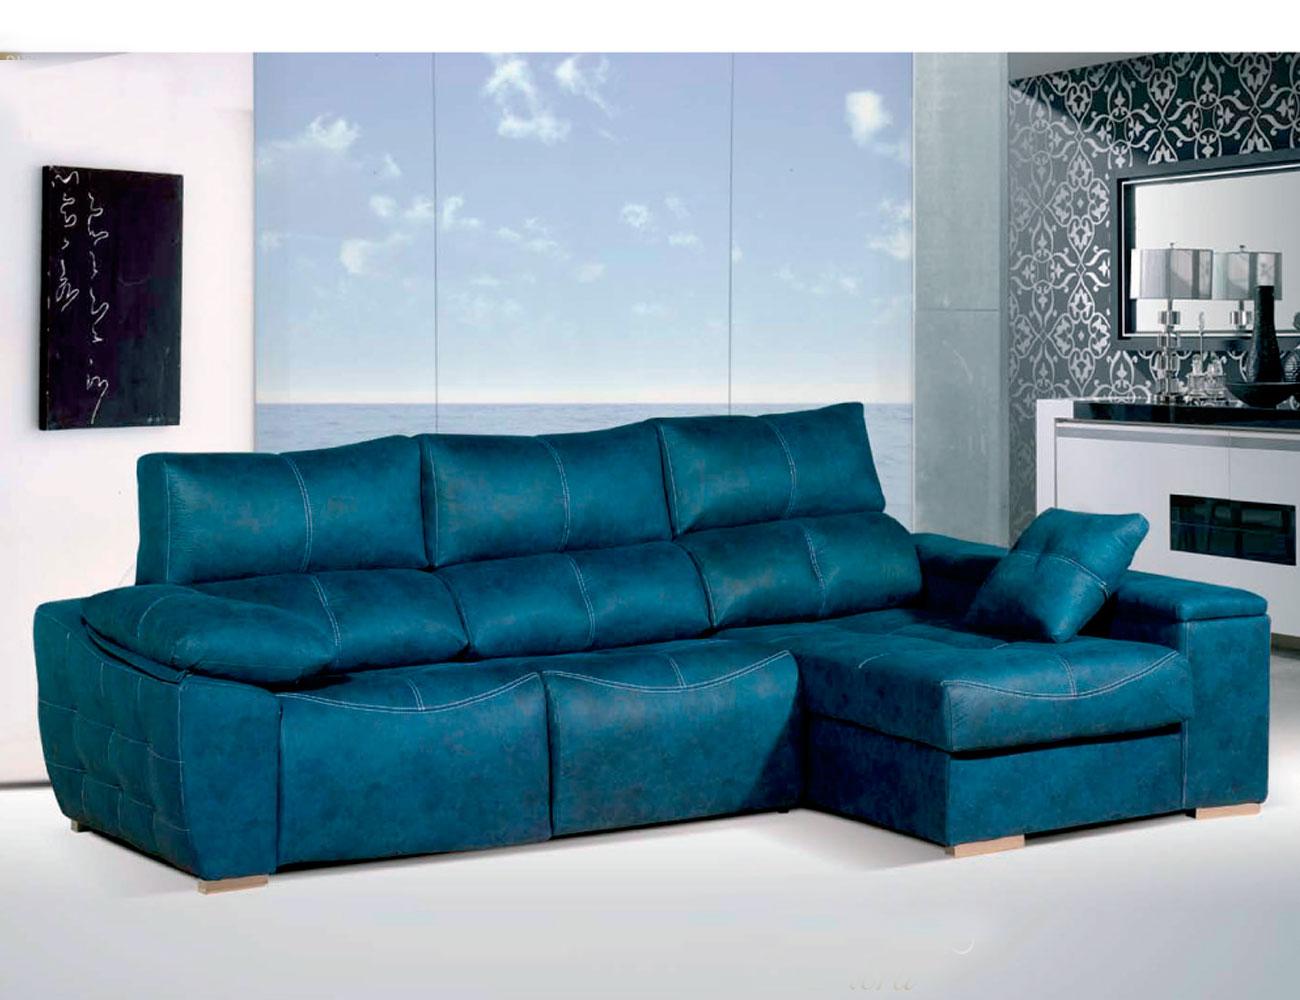 Sofa chaiselongue relax 2 motores anti manchas turquesa15